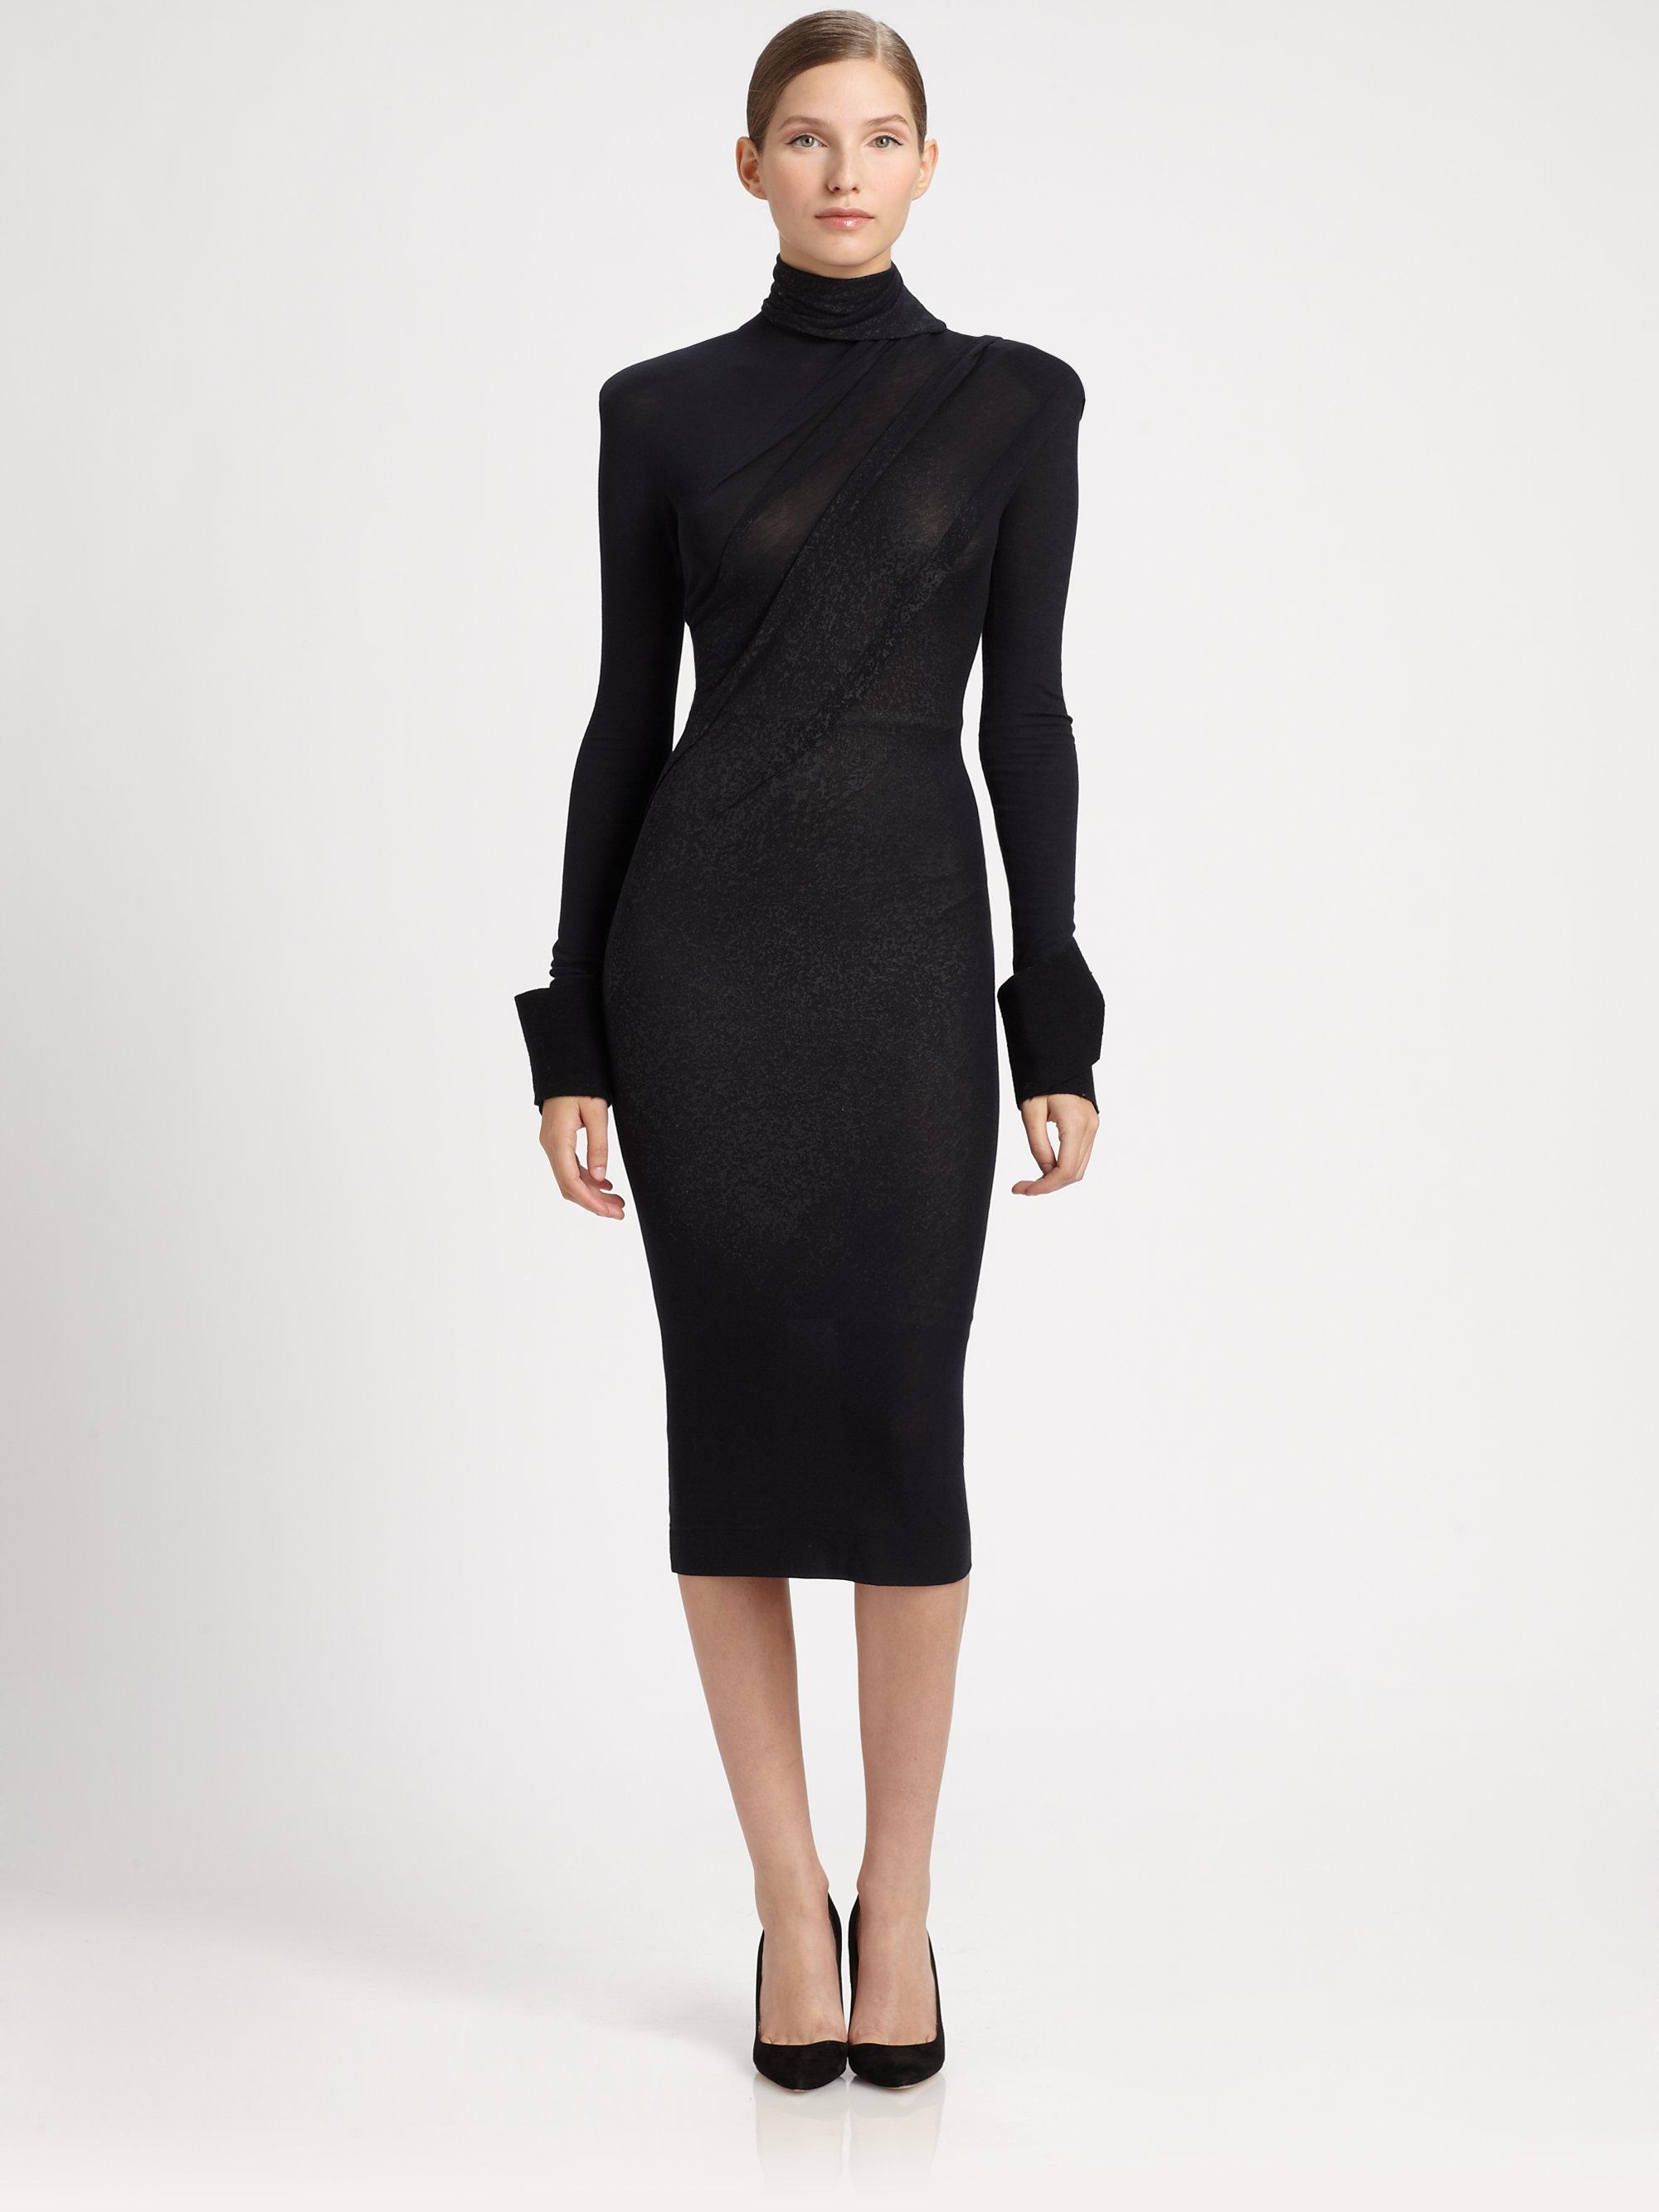 Donna karan new york devore dress in black dark navy lyst for Donna karan new york